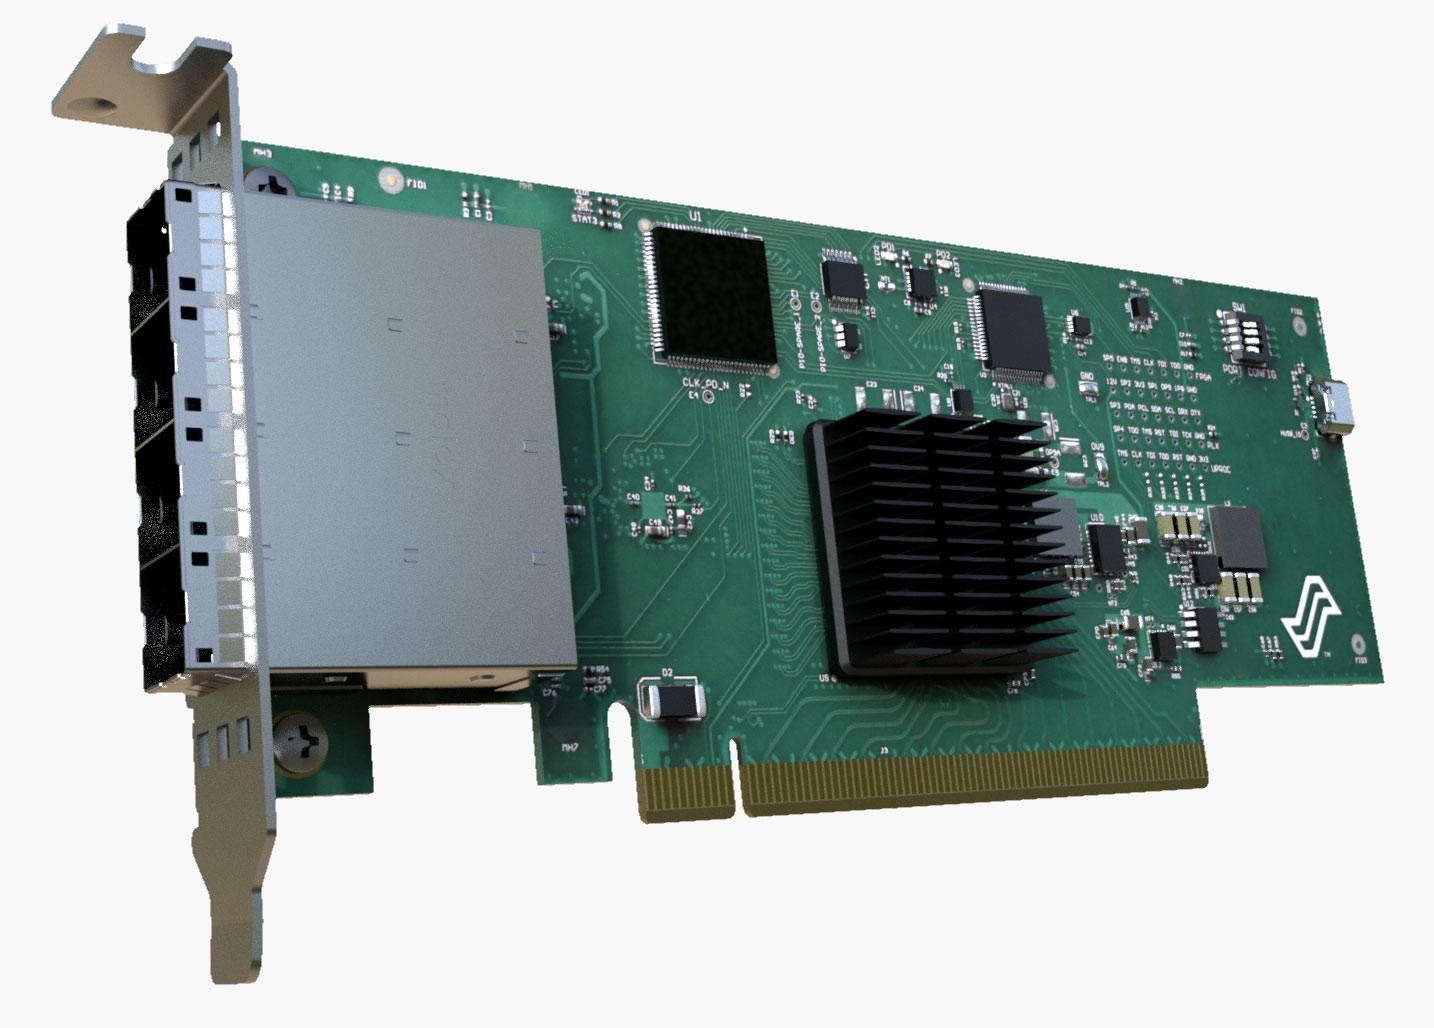 Liqid composable infrastructure LQD1416 Host Bus Adapter